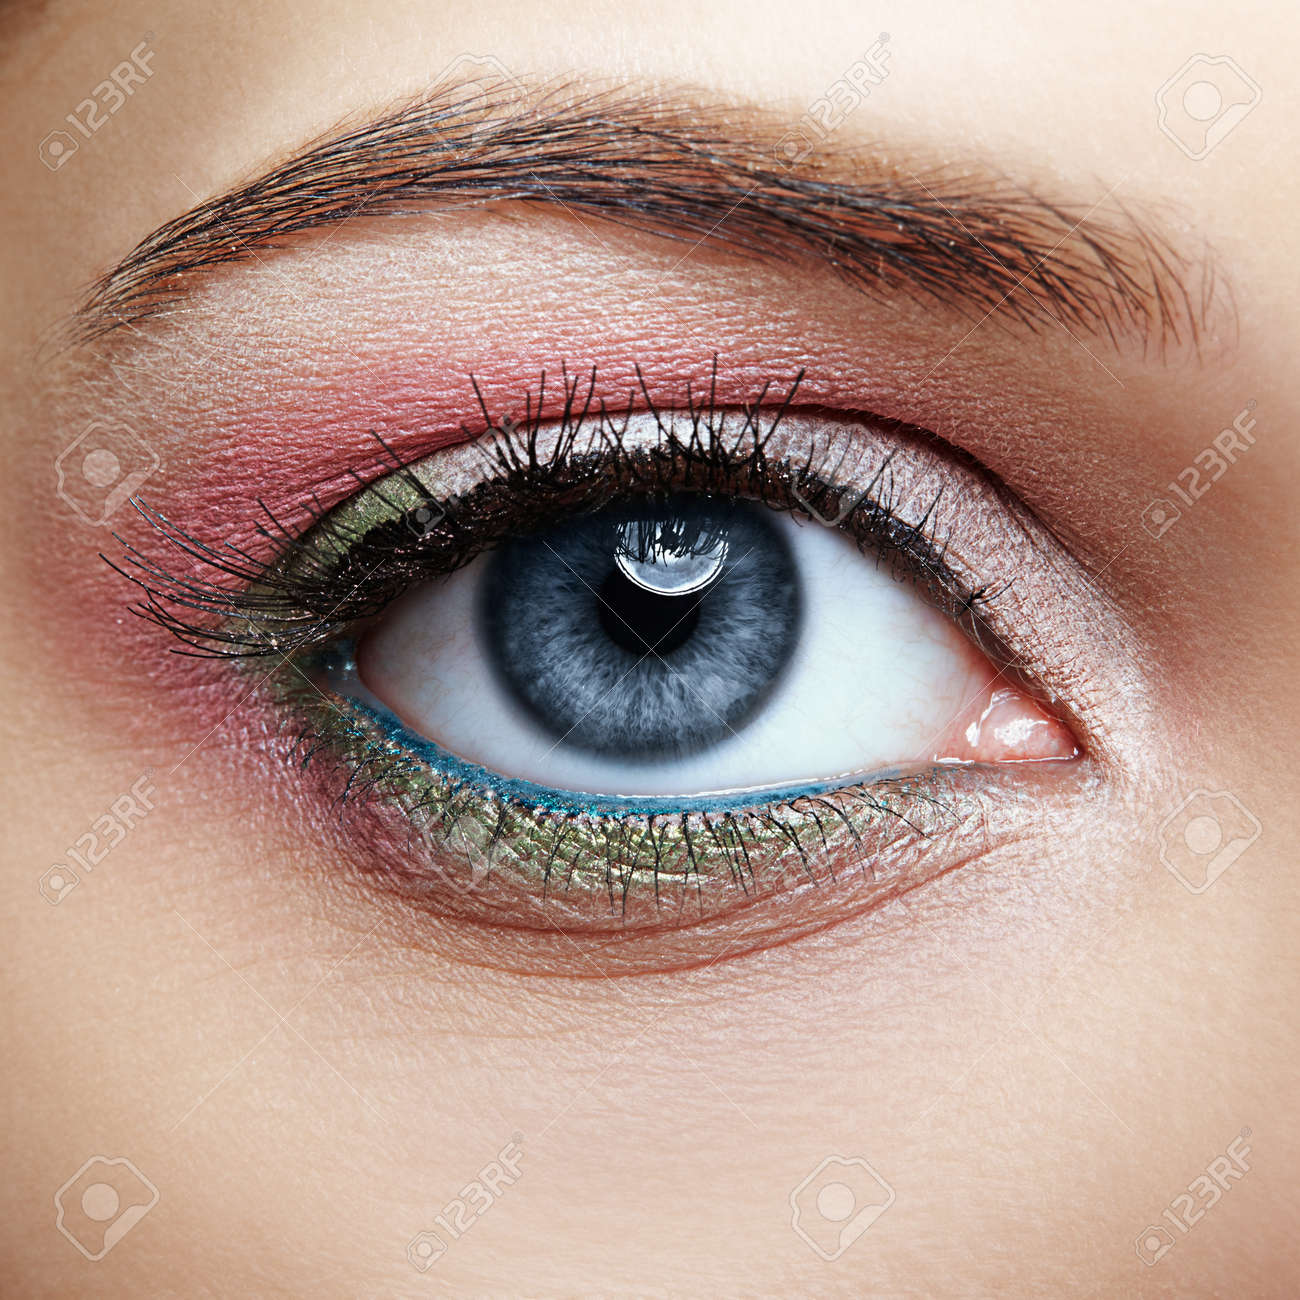 Closeup Macro Image Of Human Female Eye With Pink And Green Makeup